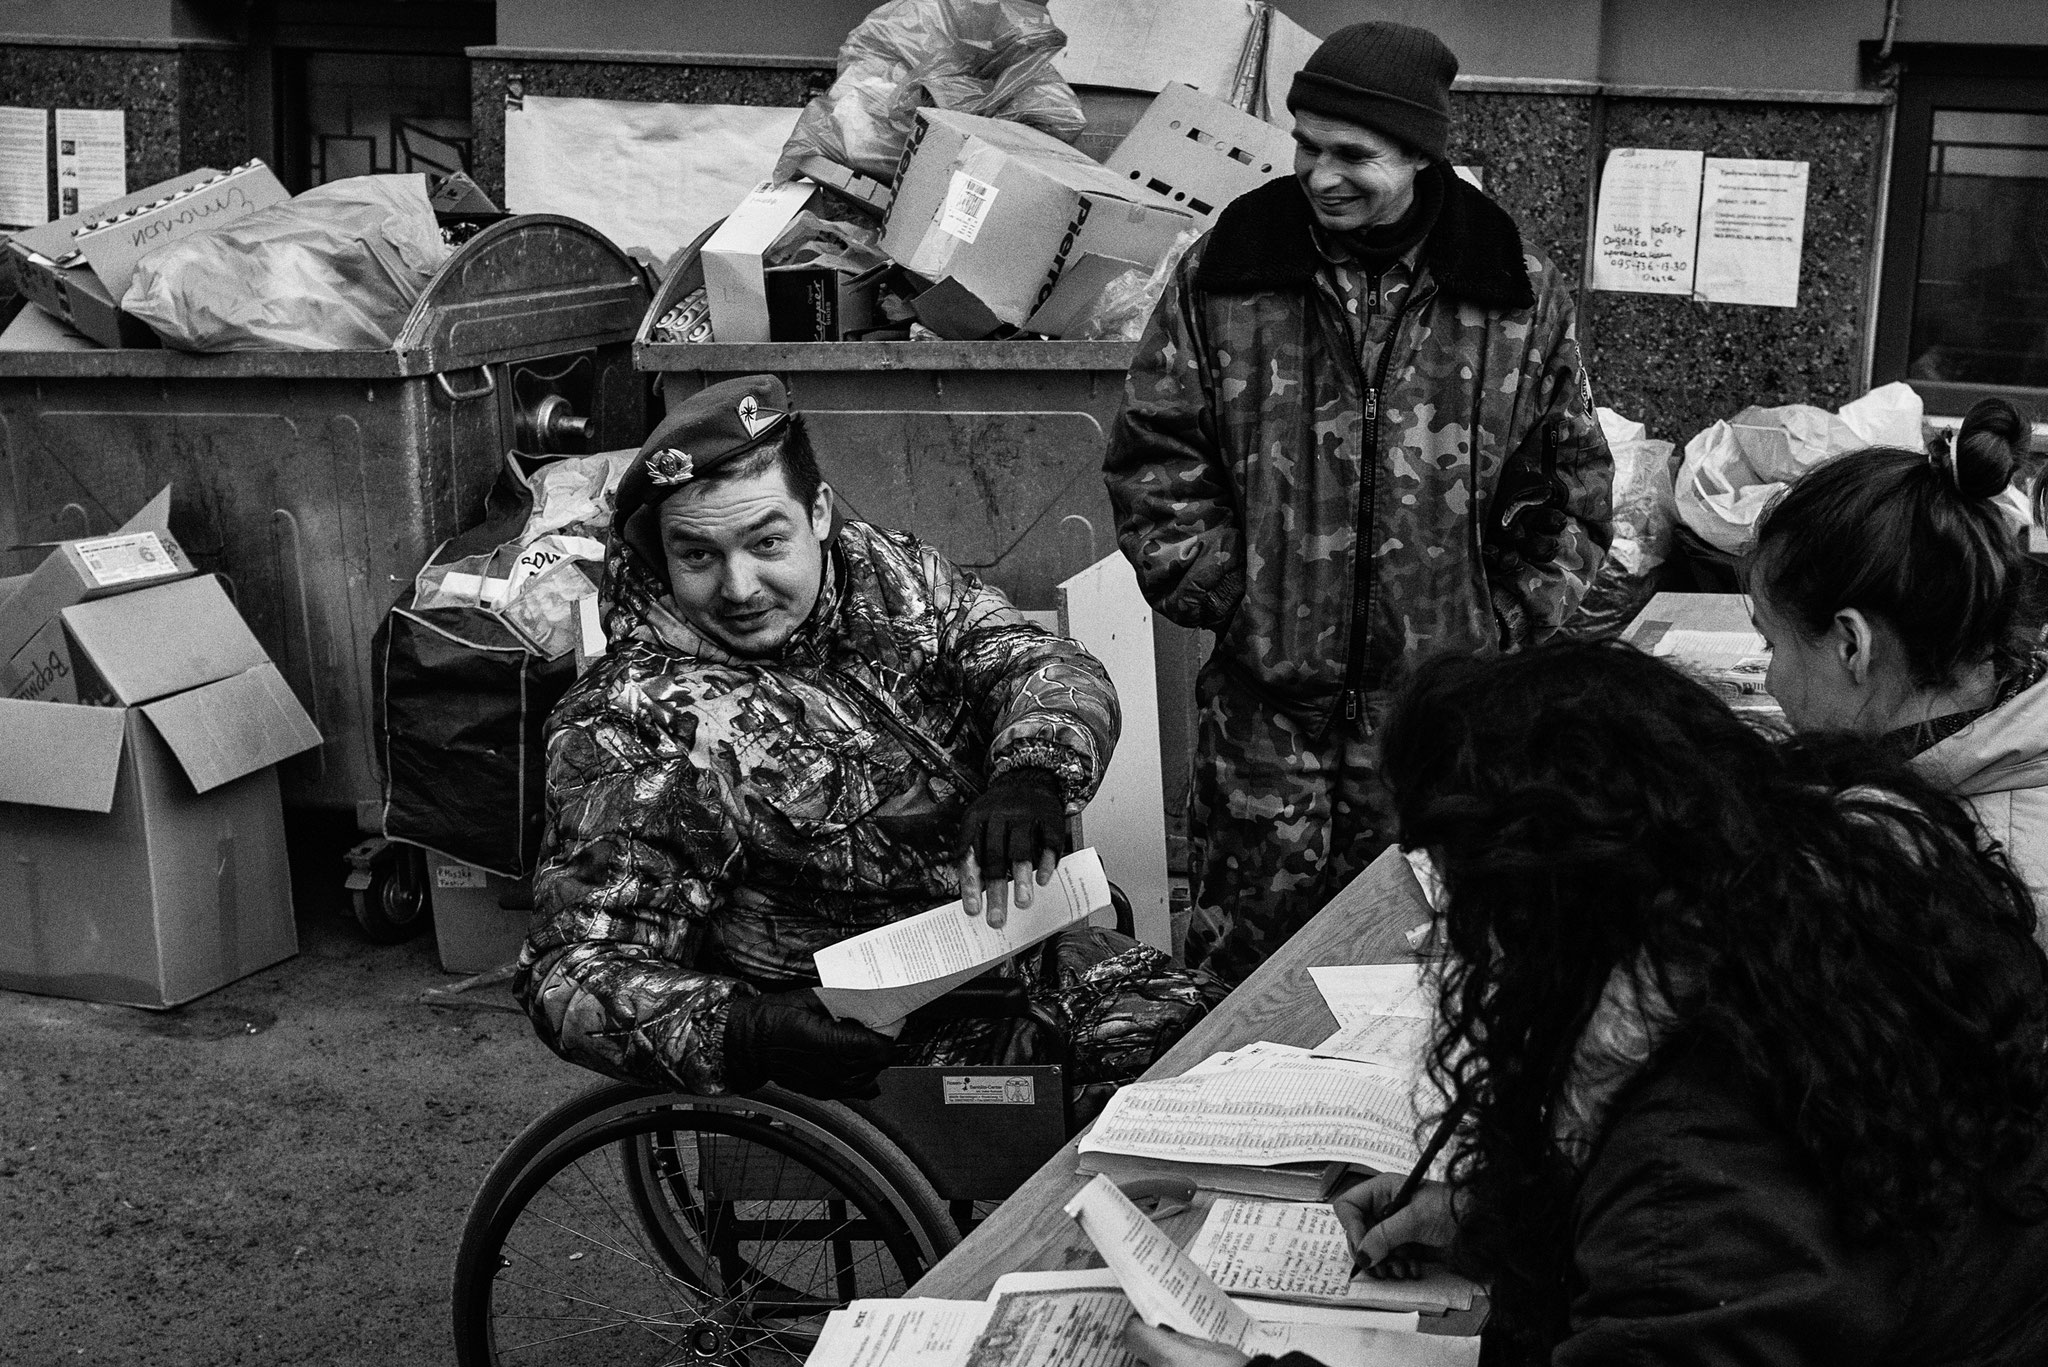 Distibution of humaitarian goods, Kiev 2014